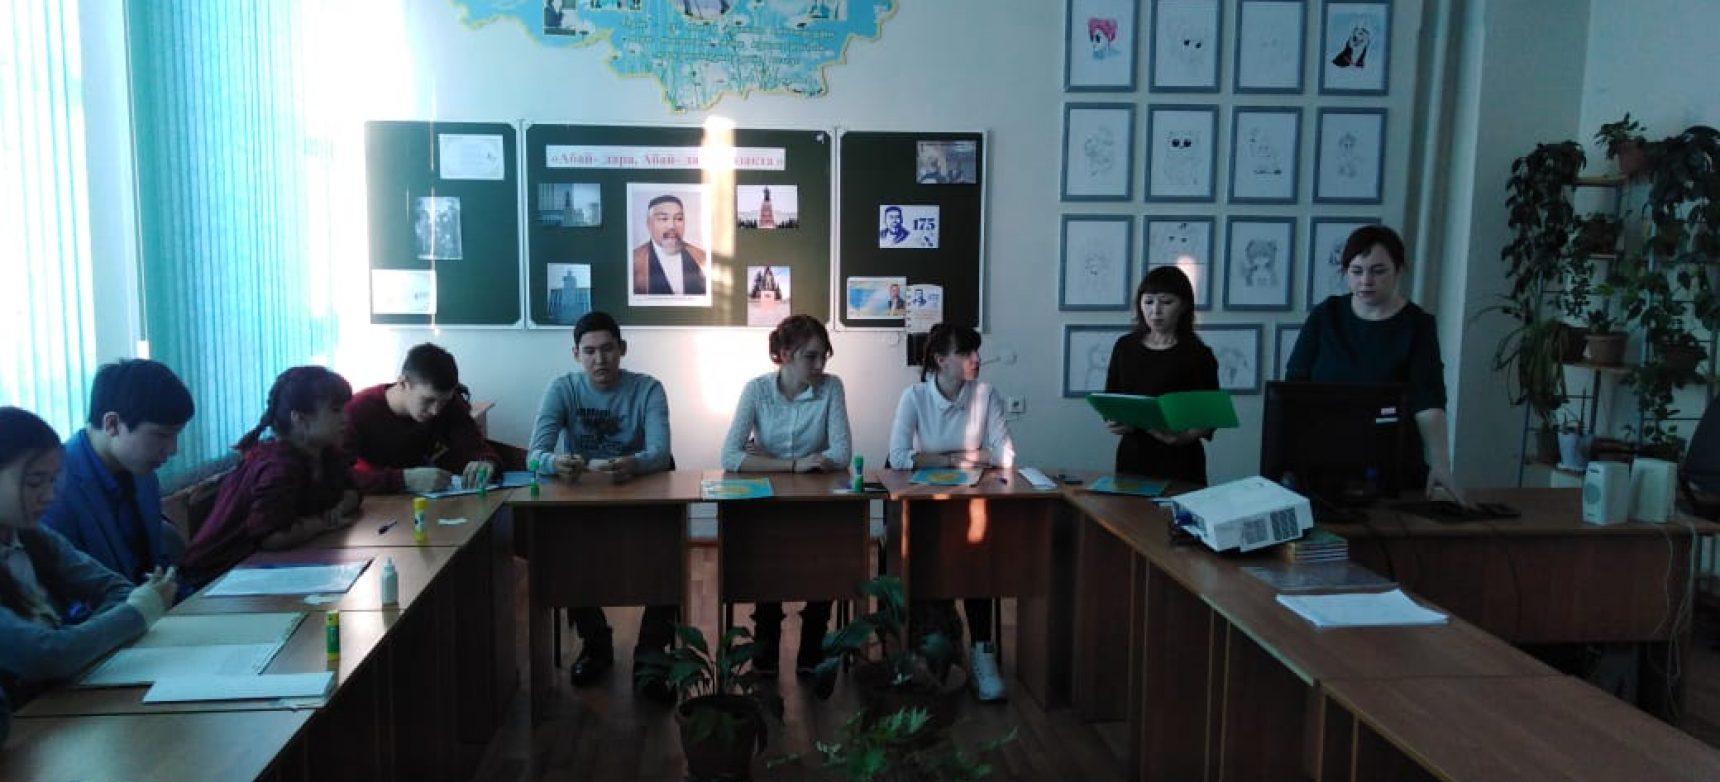 Открытый классный час «Абай-дара, Абай-дана қазақта».